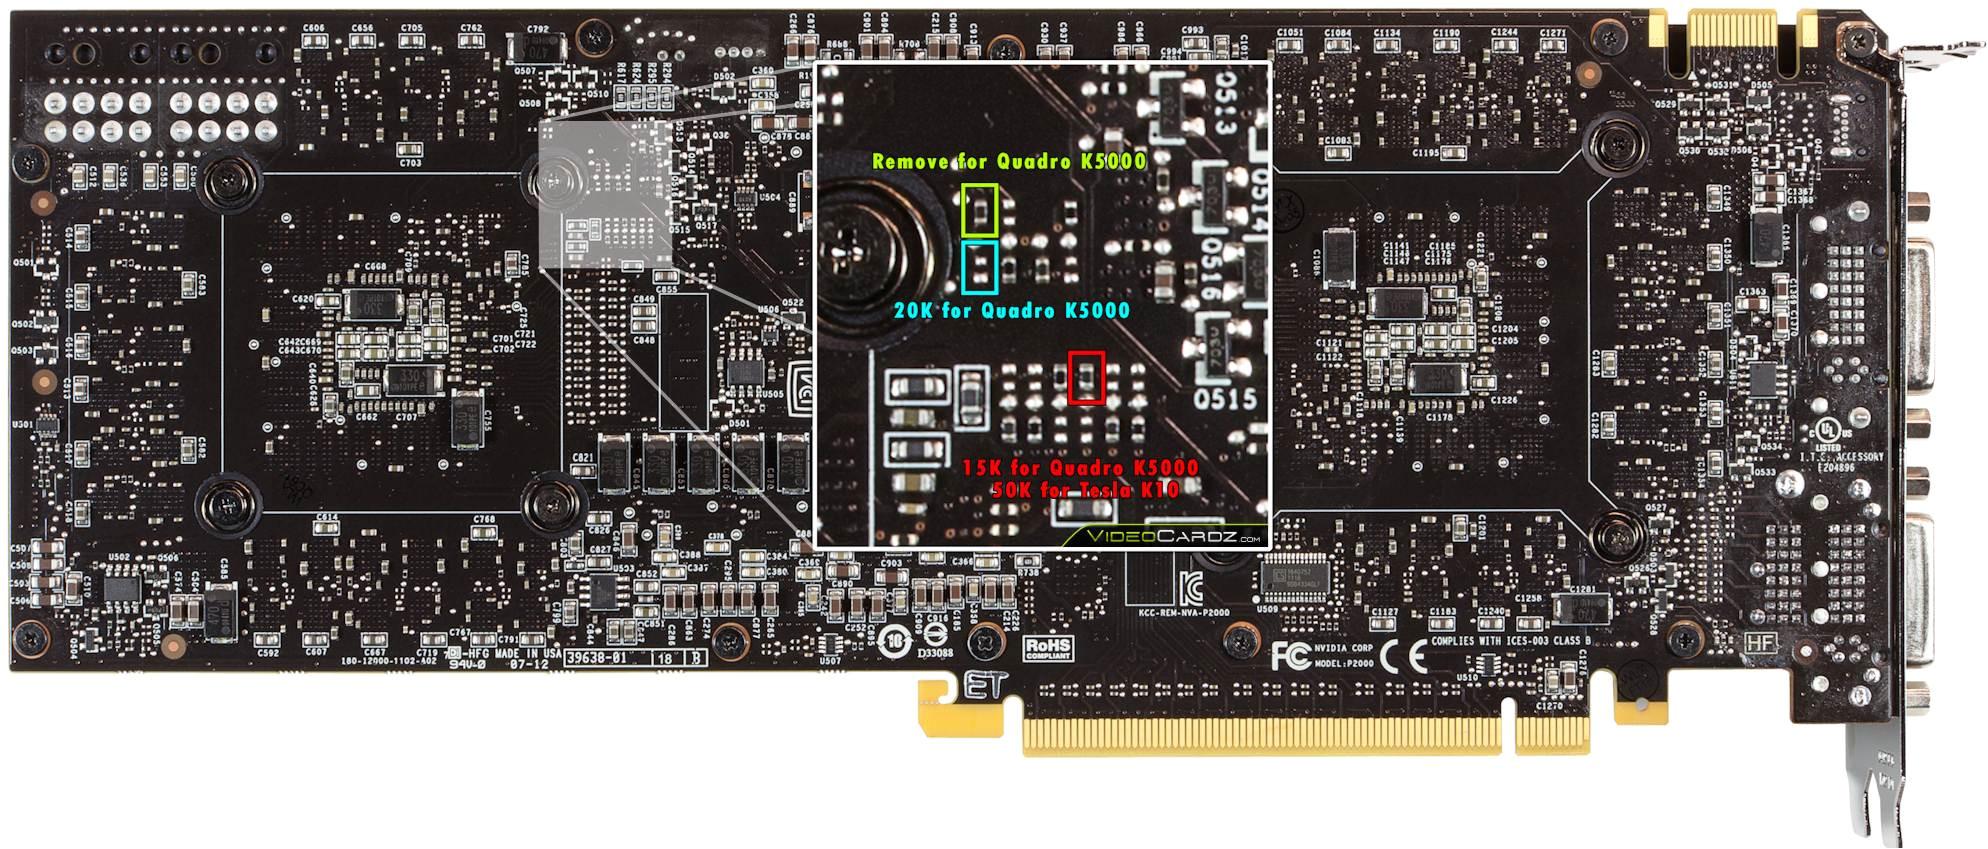 geforce gtx 690 into quadro k5000 jpg